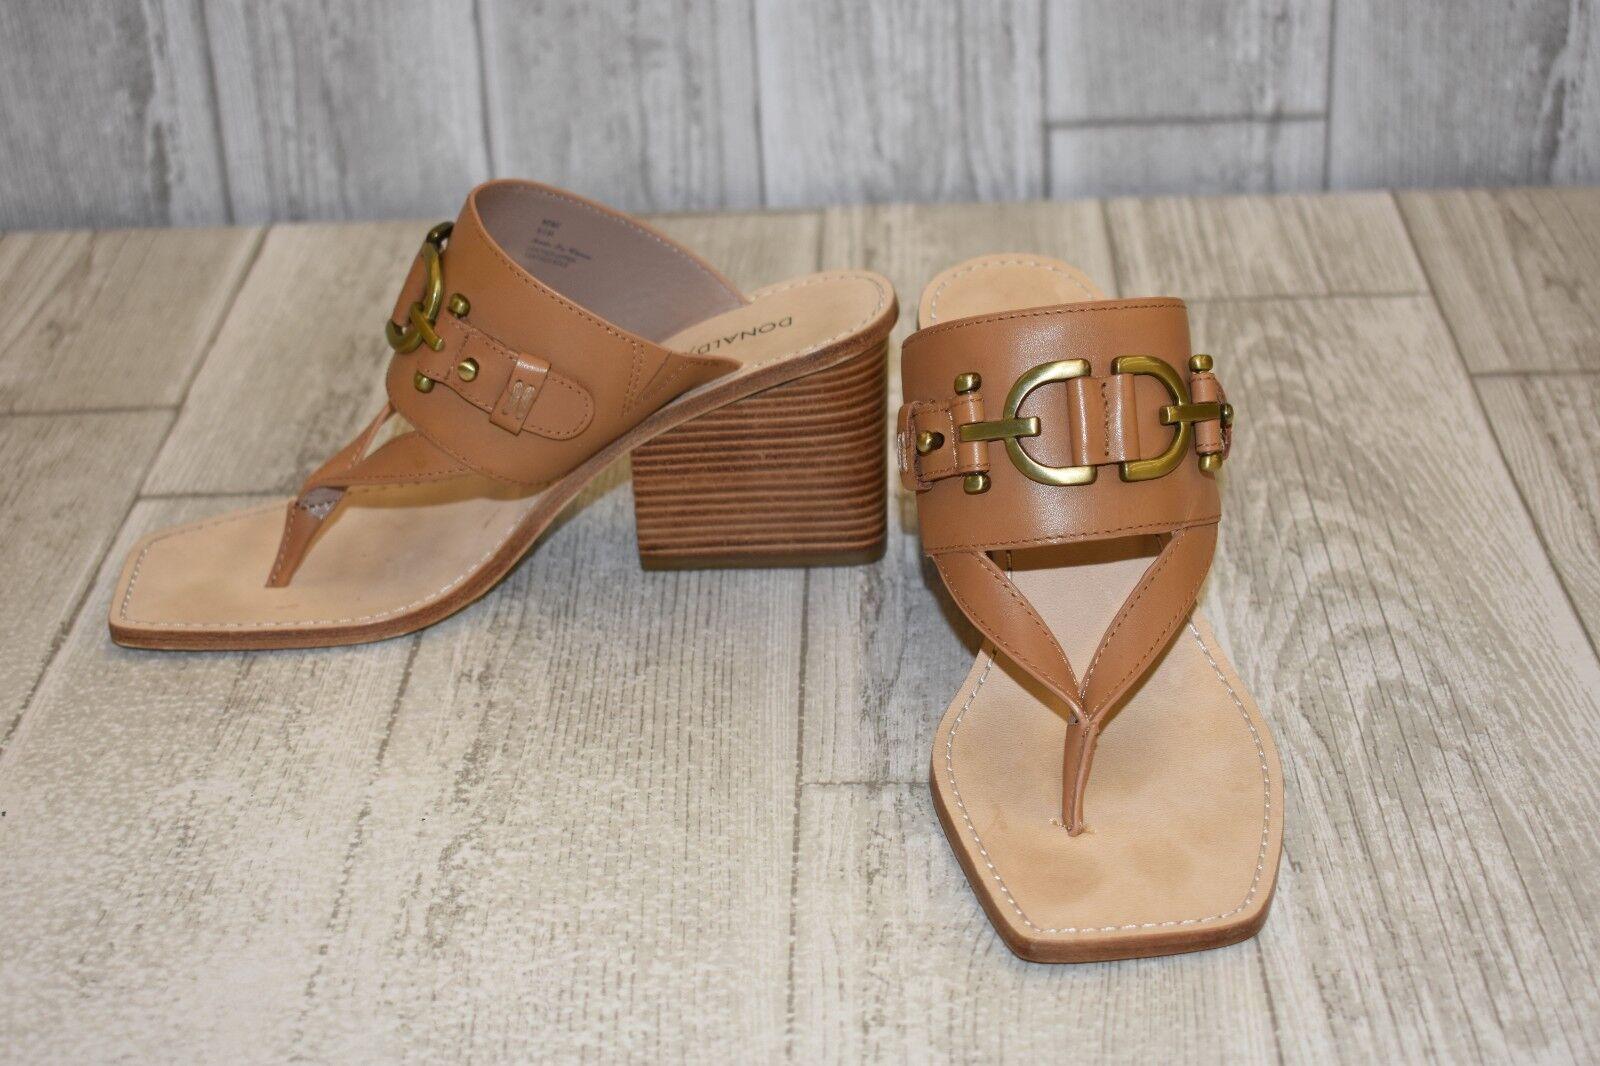 Donald J Pliner Mimi Thong Heeled Sandal - Women's Size 6.5M, Tan